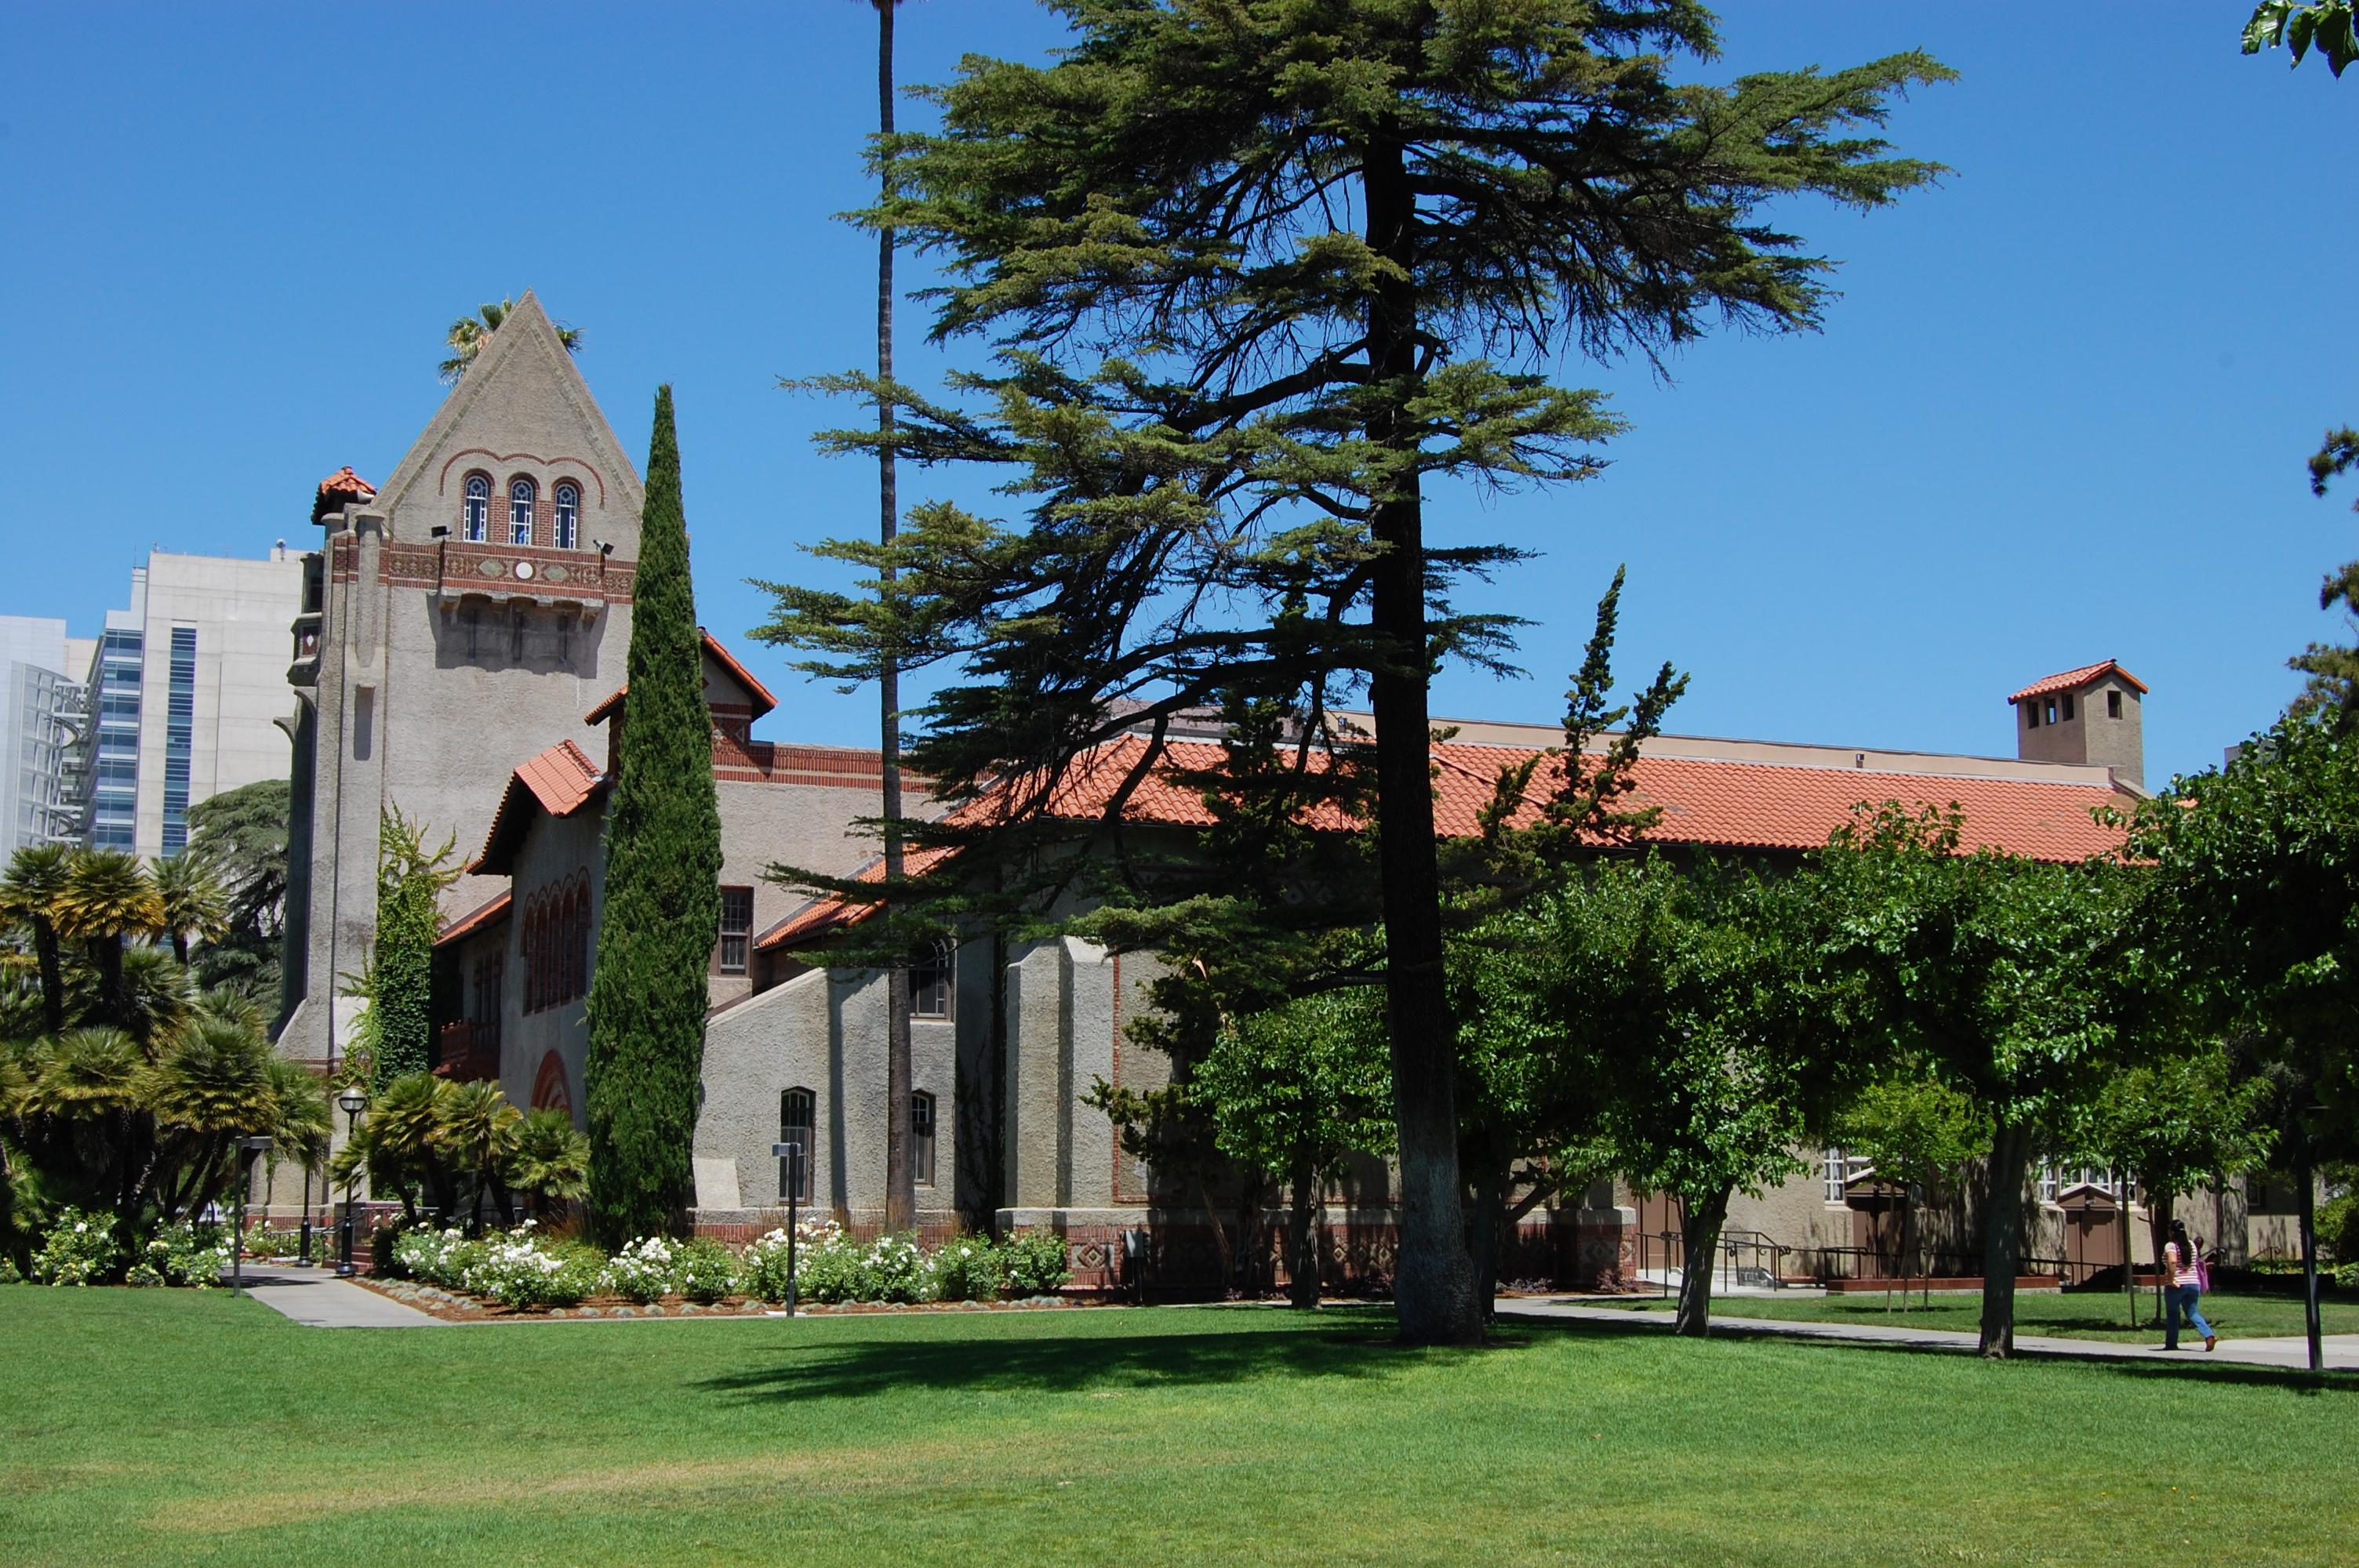 Description usa san jose state university tower hall 1